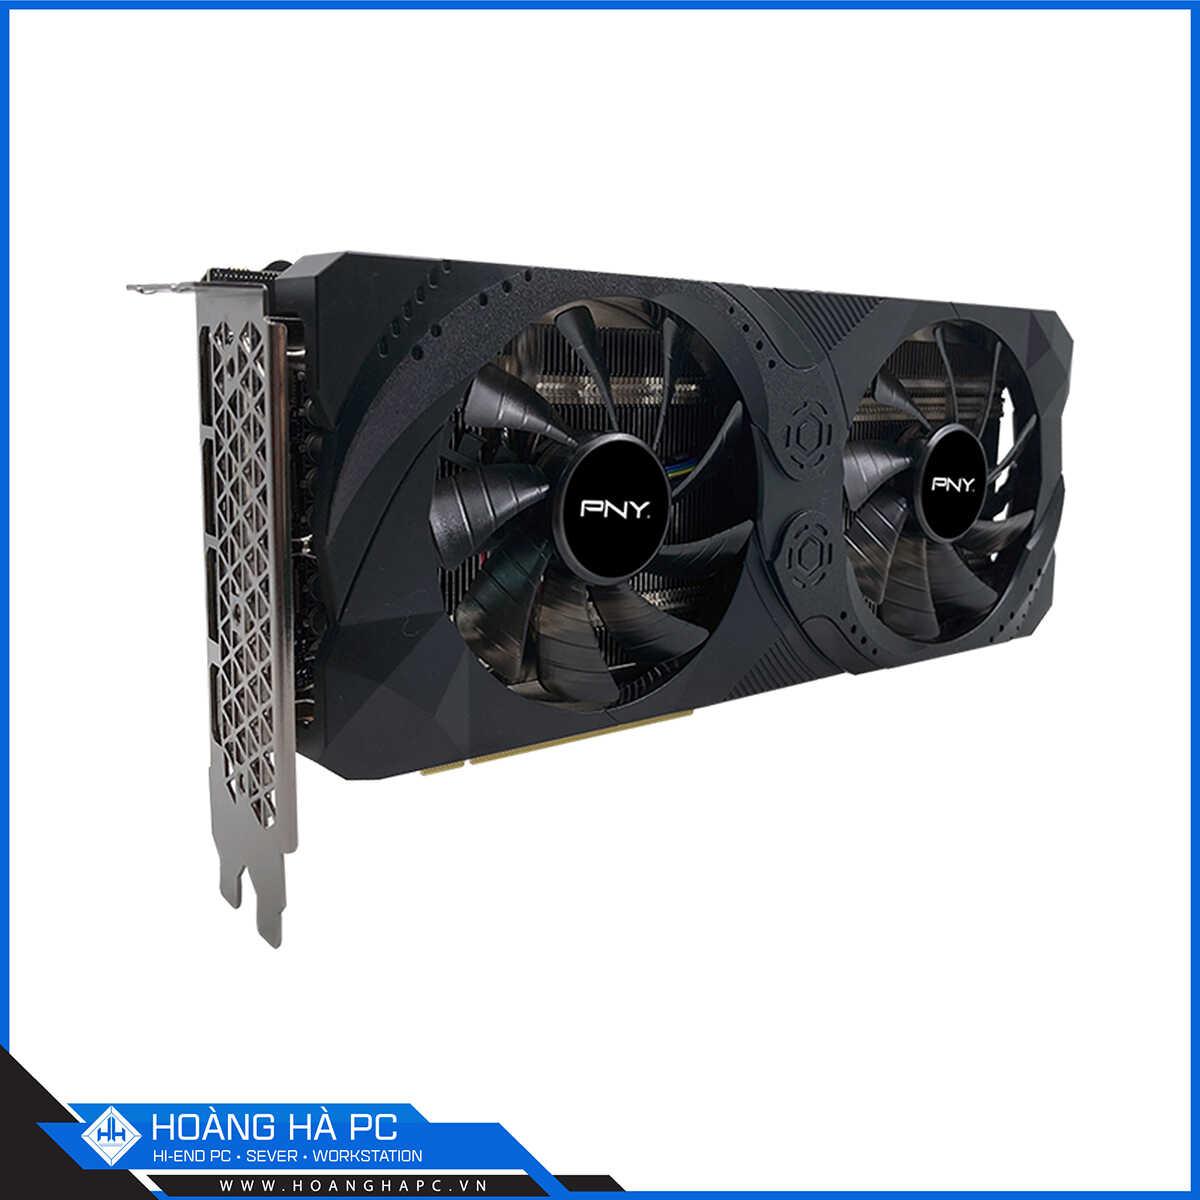 VGA PNY GeForce RTX 3060 Ti 8GB UPRISING Dual Fan